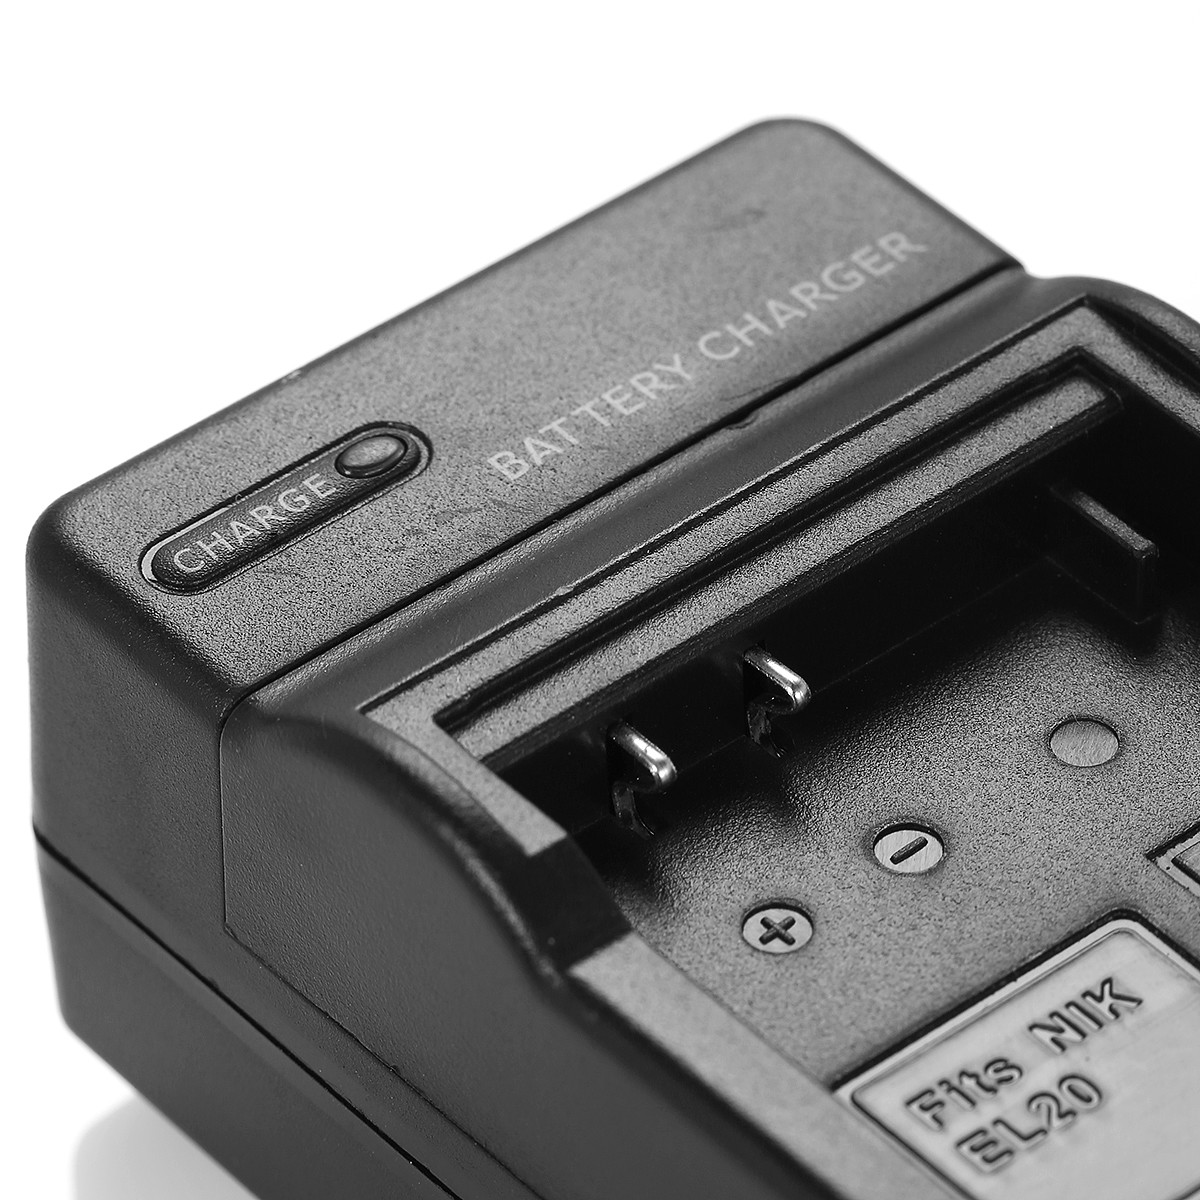 Nikon 1 aw1 | waterproof, shockproof, freezeproof advanced camera.